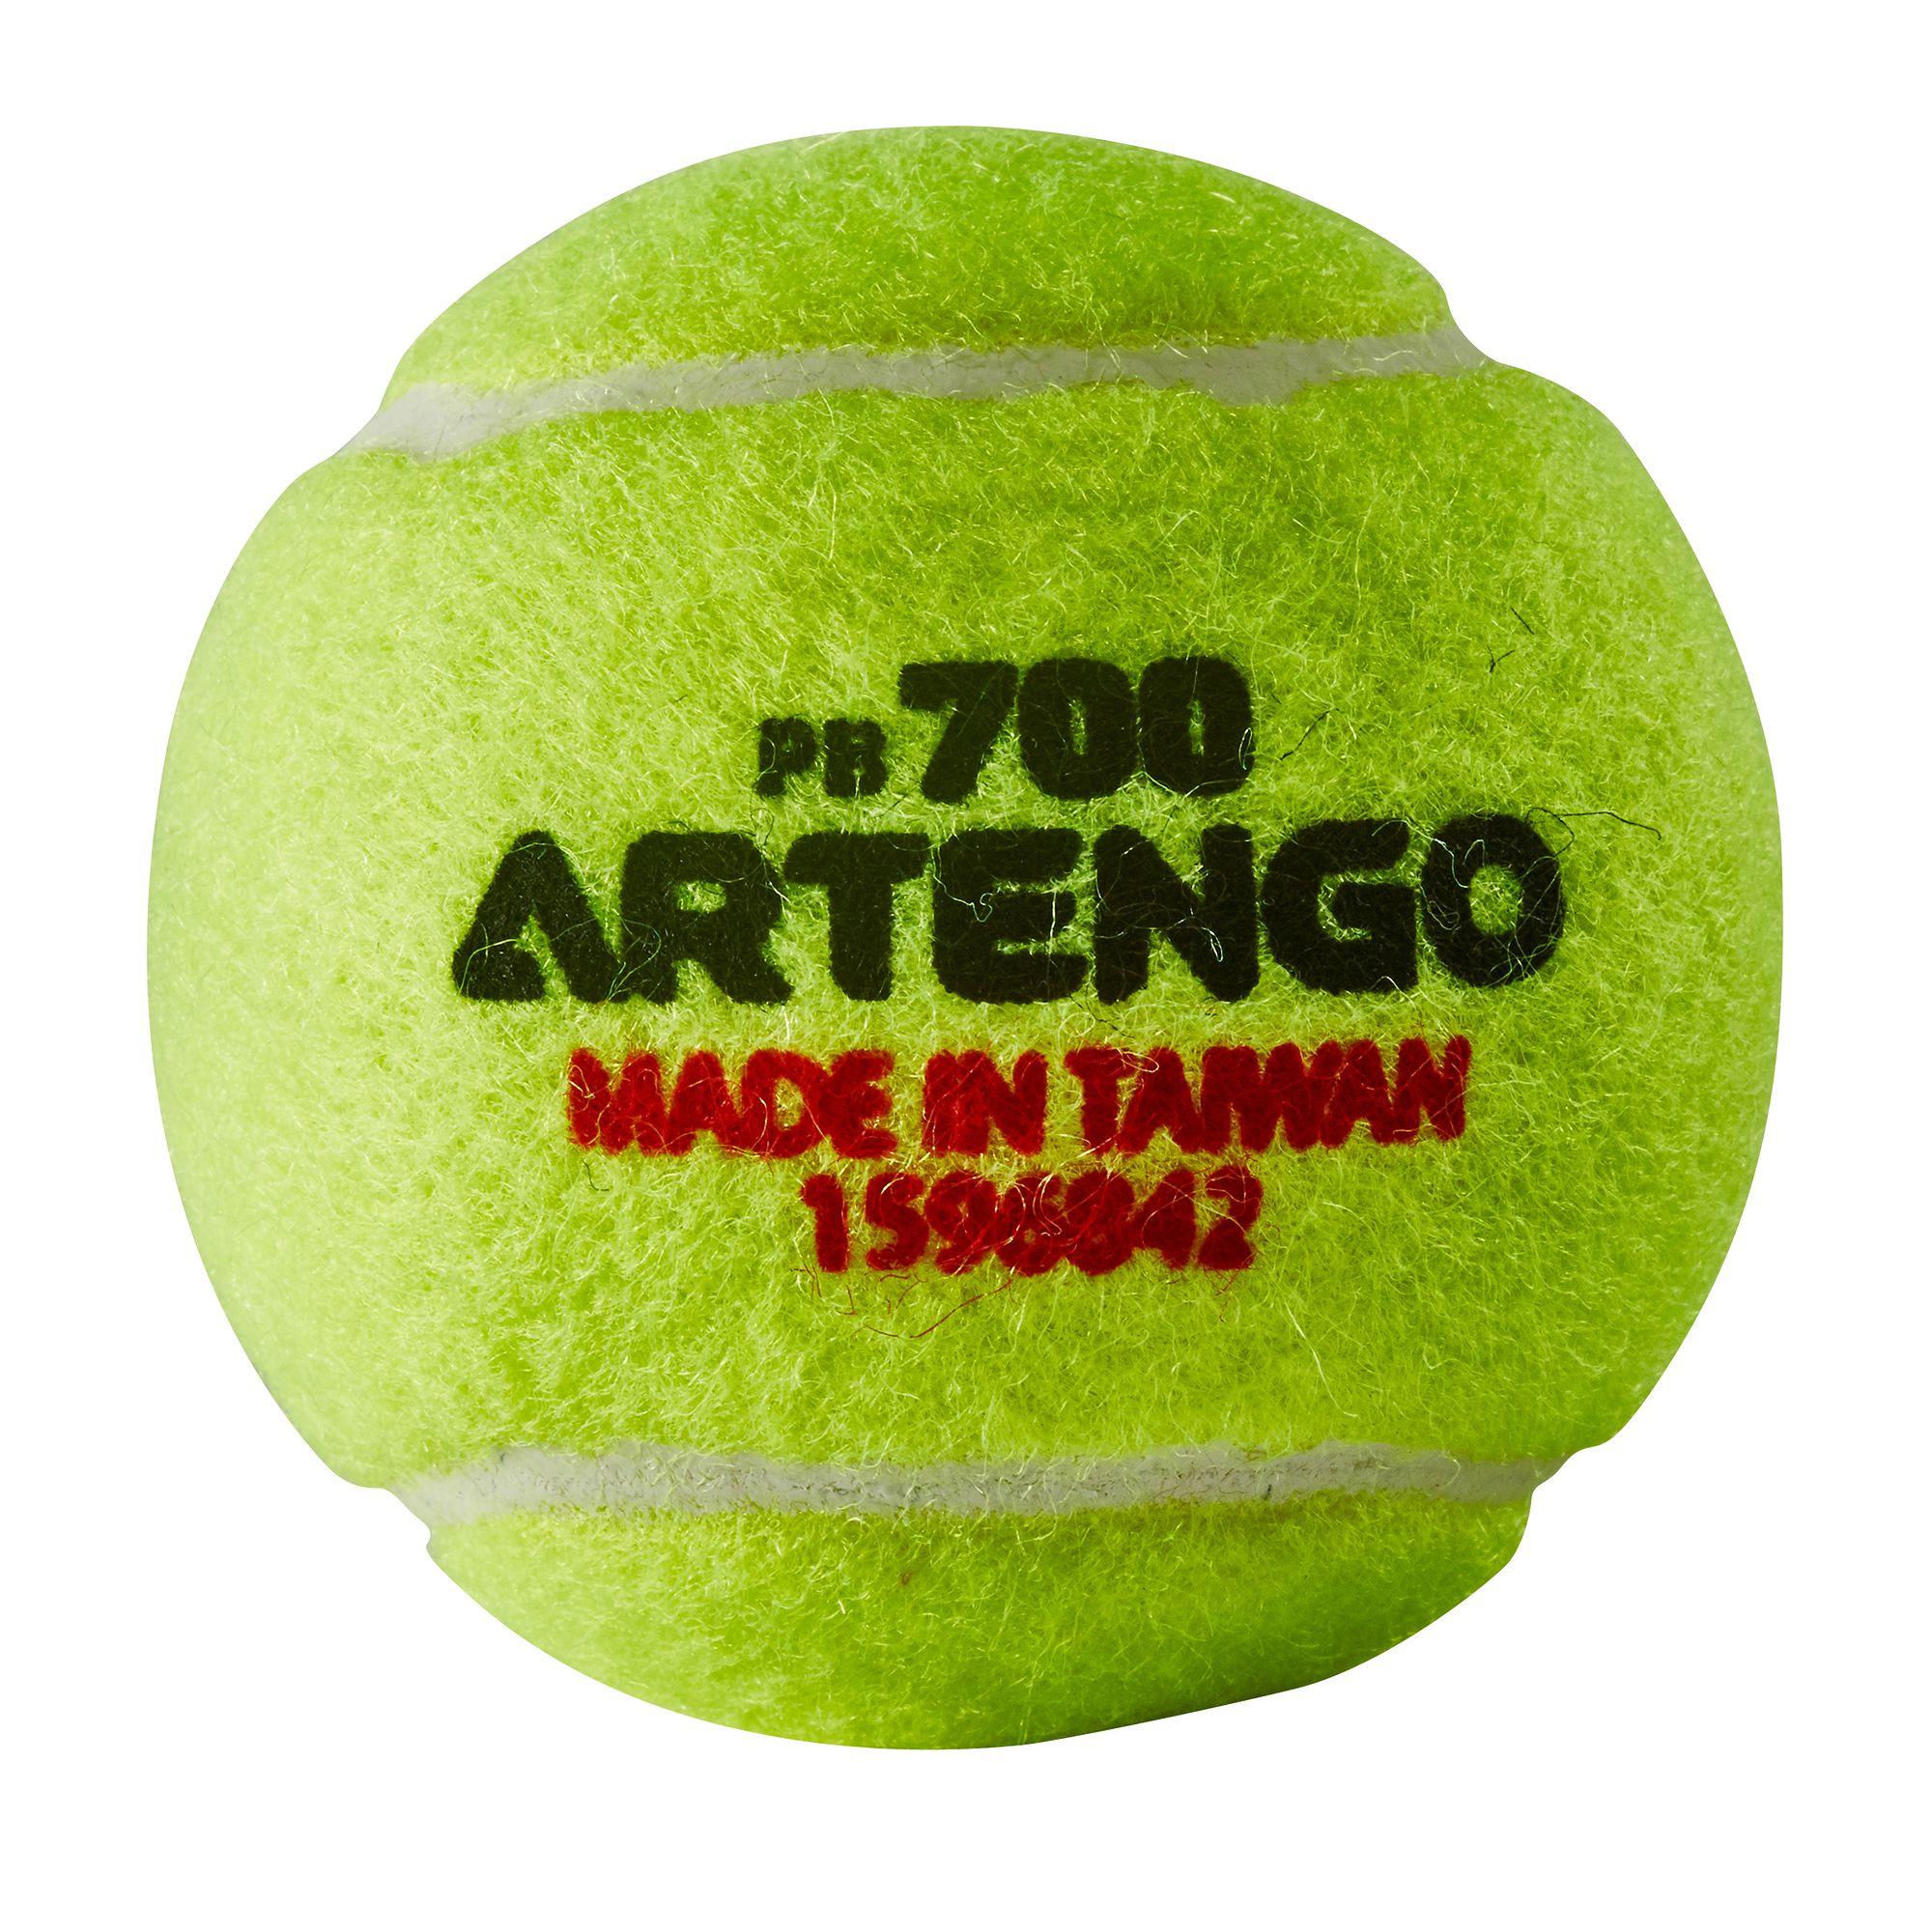 PB 700 CLUB x 50